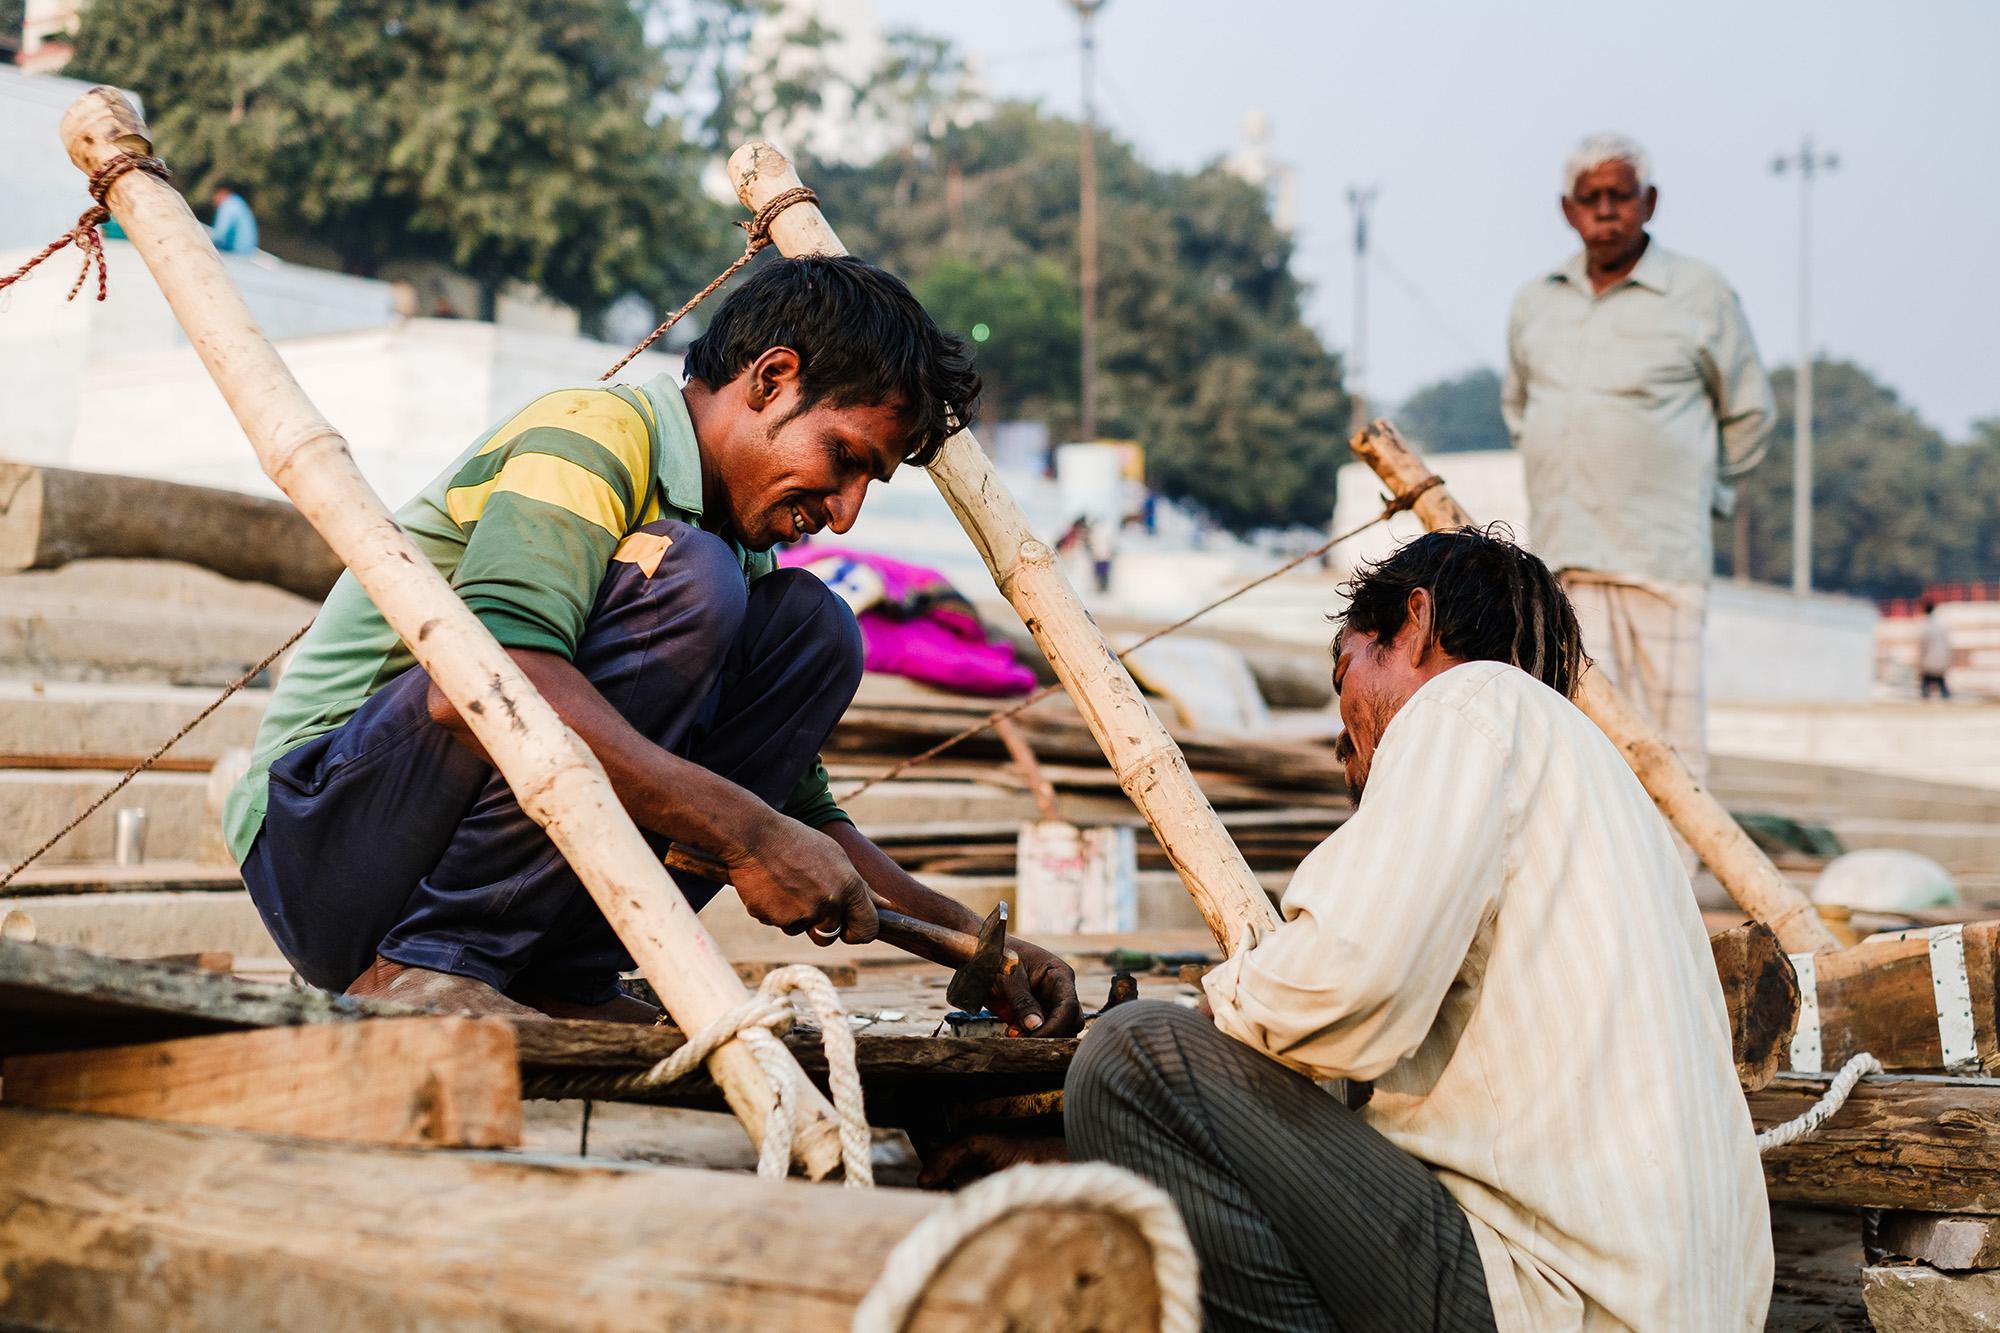 AnjaPoehlmann_India-Varanasi_138.jpg